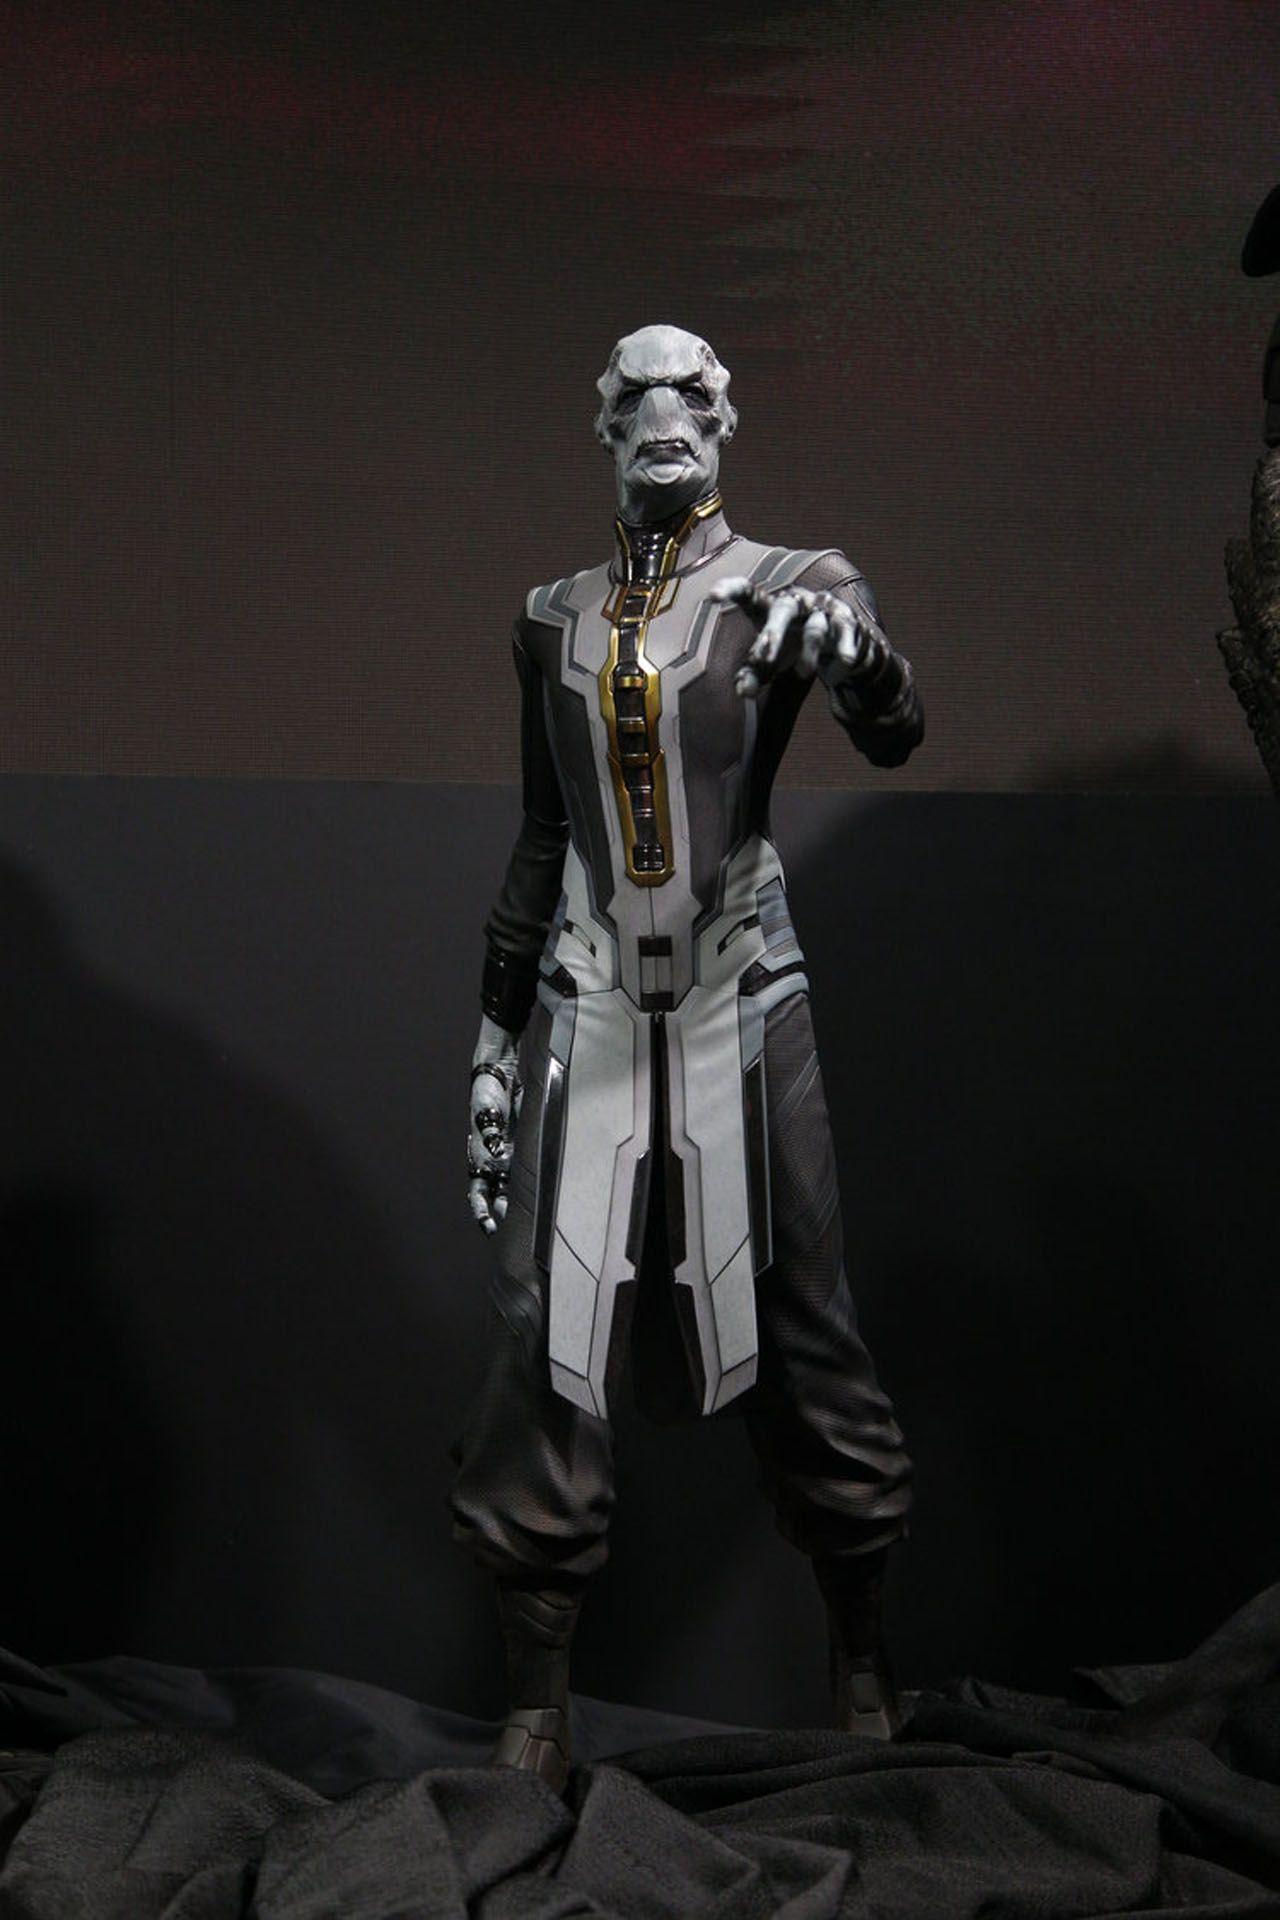 pinprathiush on action figure | avengers, infinity war, marvel